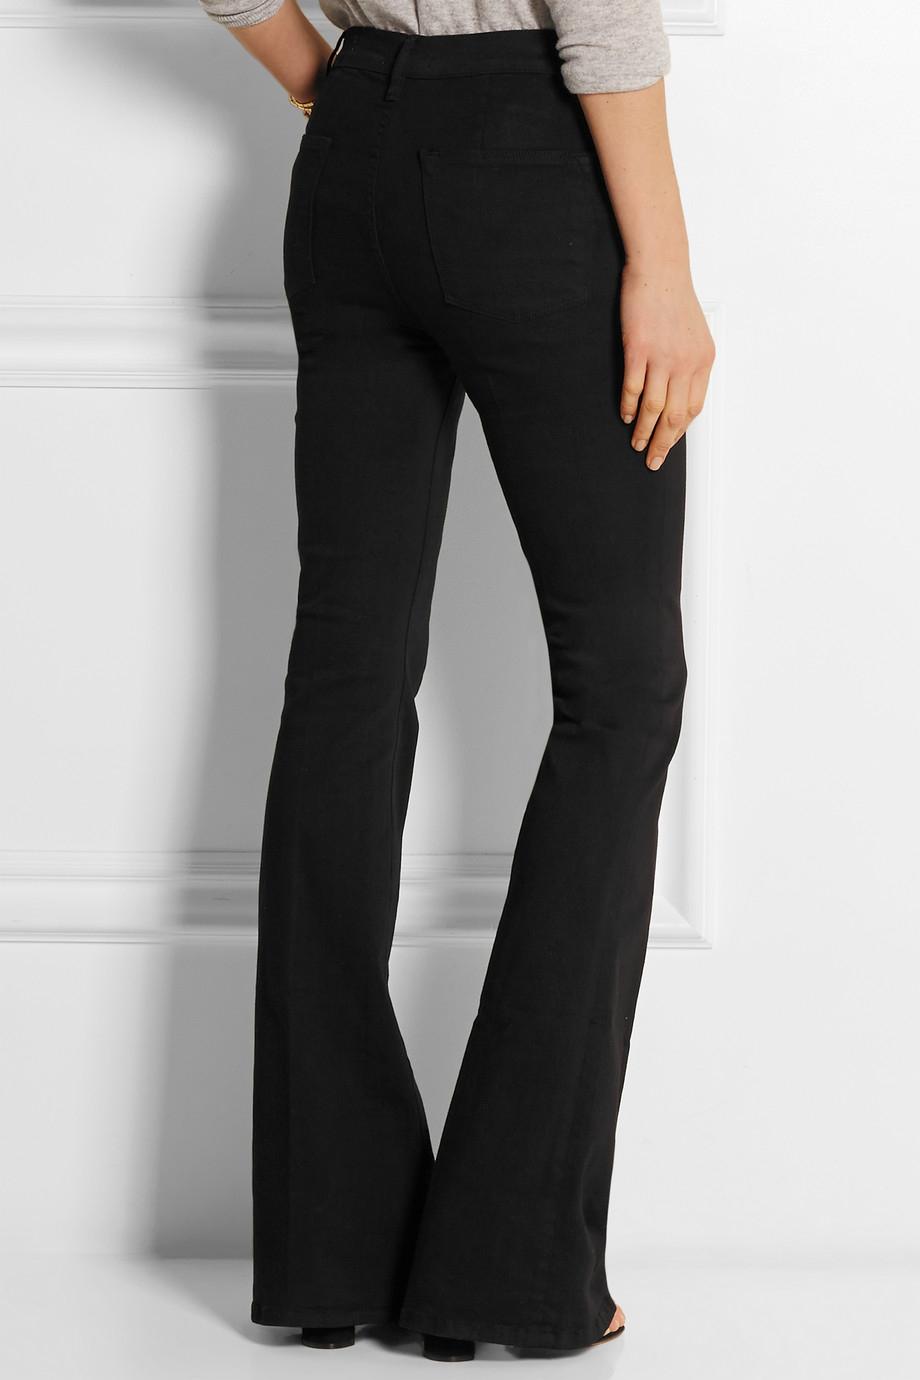 Le High High-rise Flared Jeans - Dark denim Frame Denim tJljnlWr9